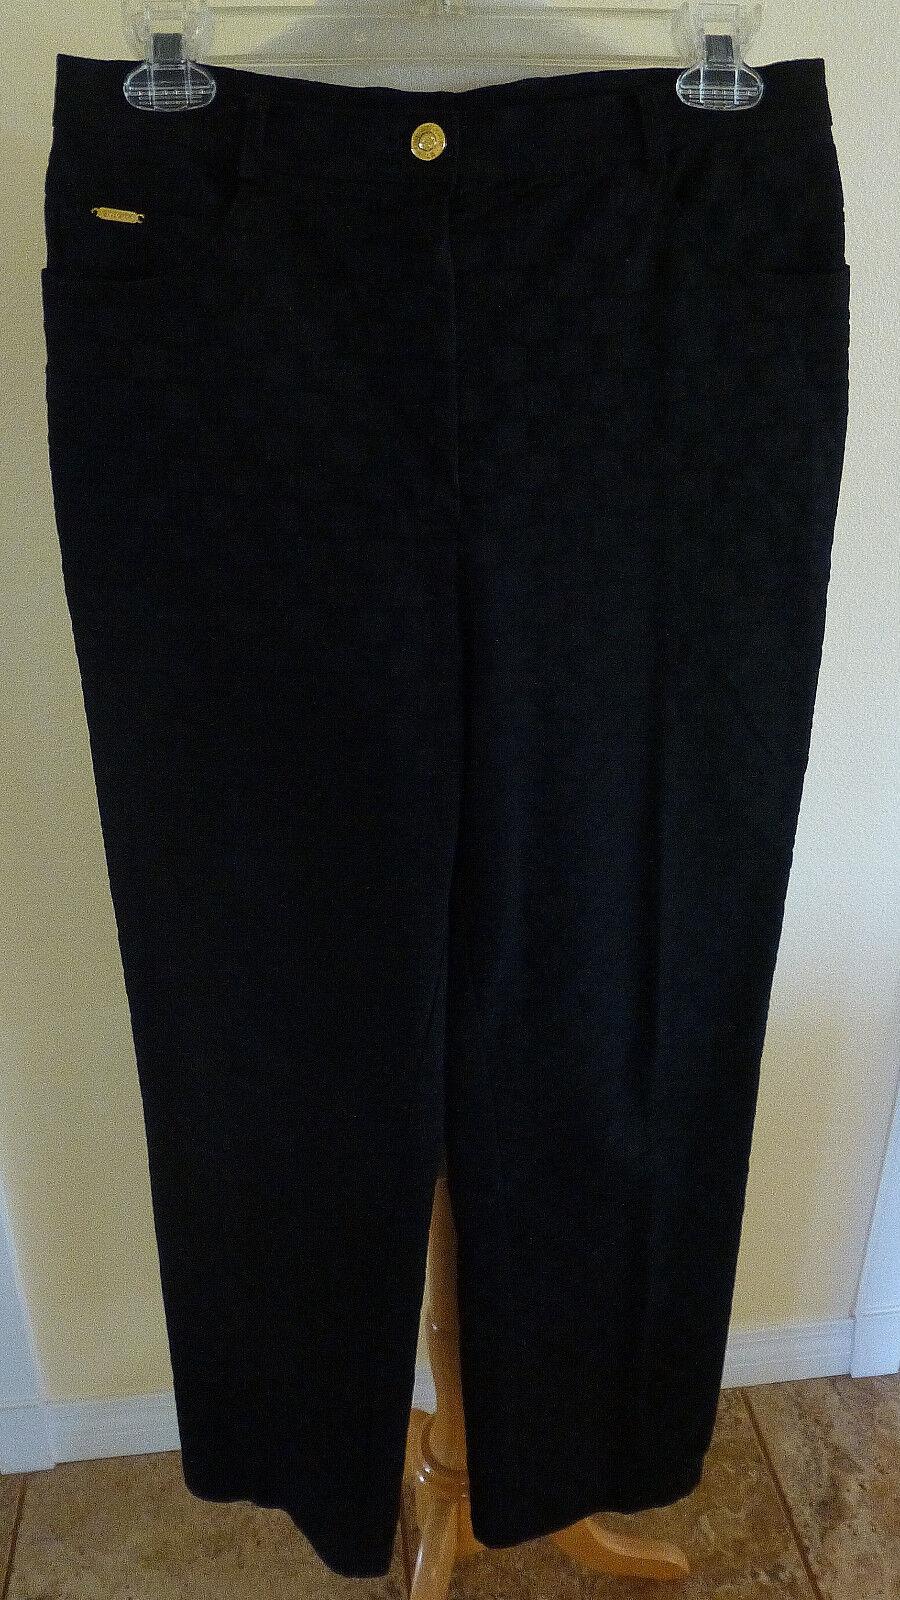 ST. JOHN noir en coton extensible ton sur ton SJ Logo Estampé Skinny Jambe Pantalon comme NEUF 6